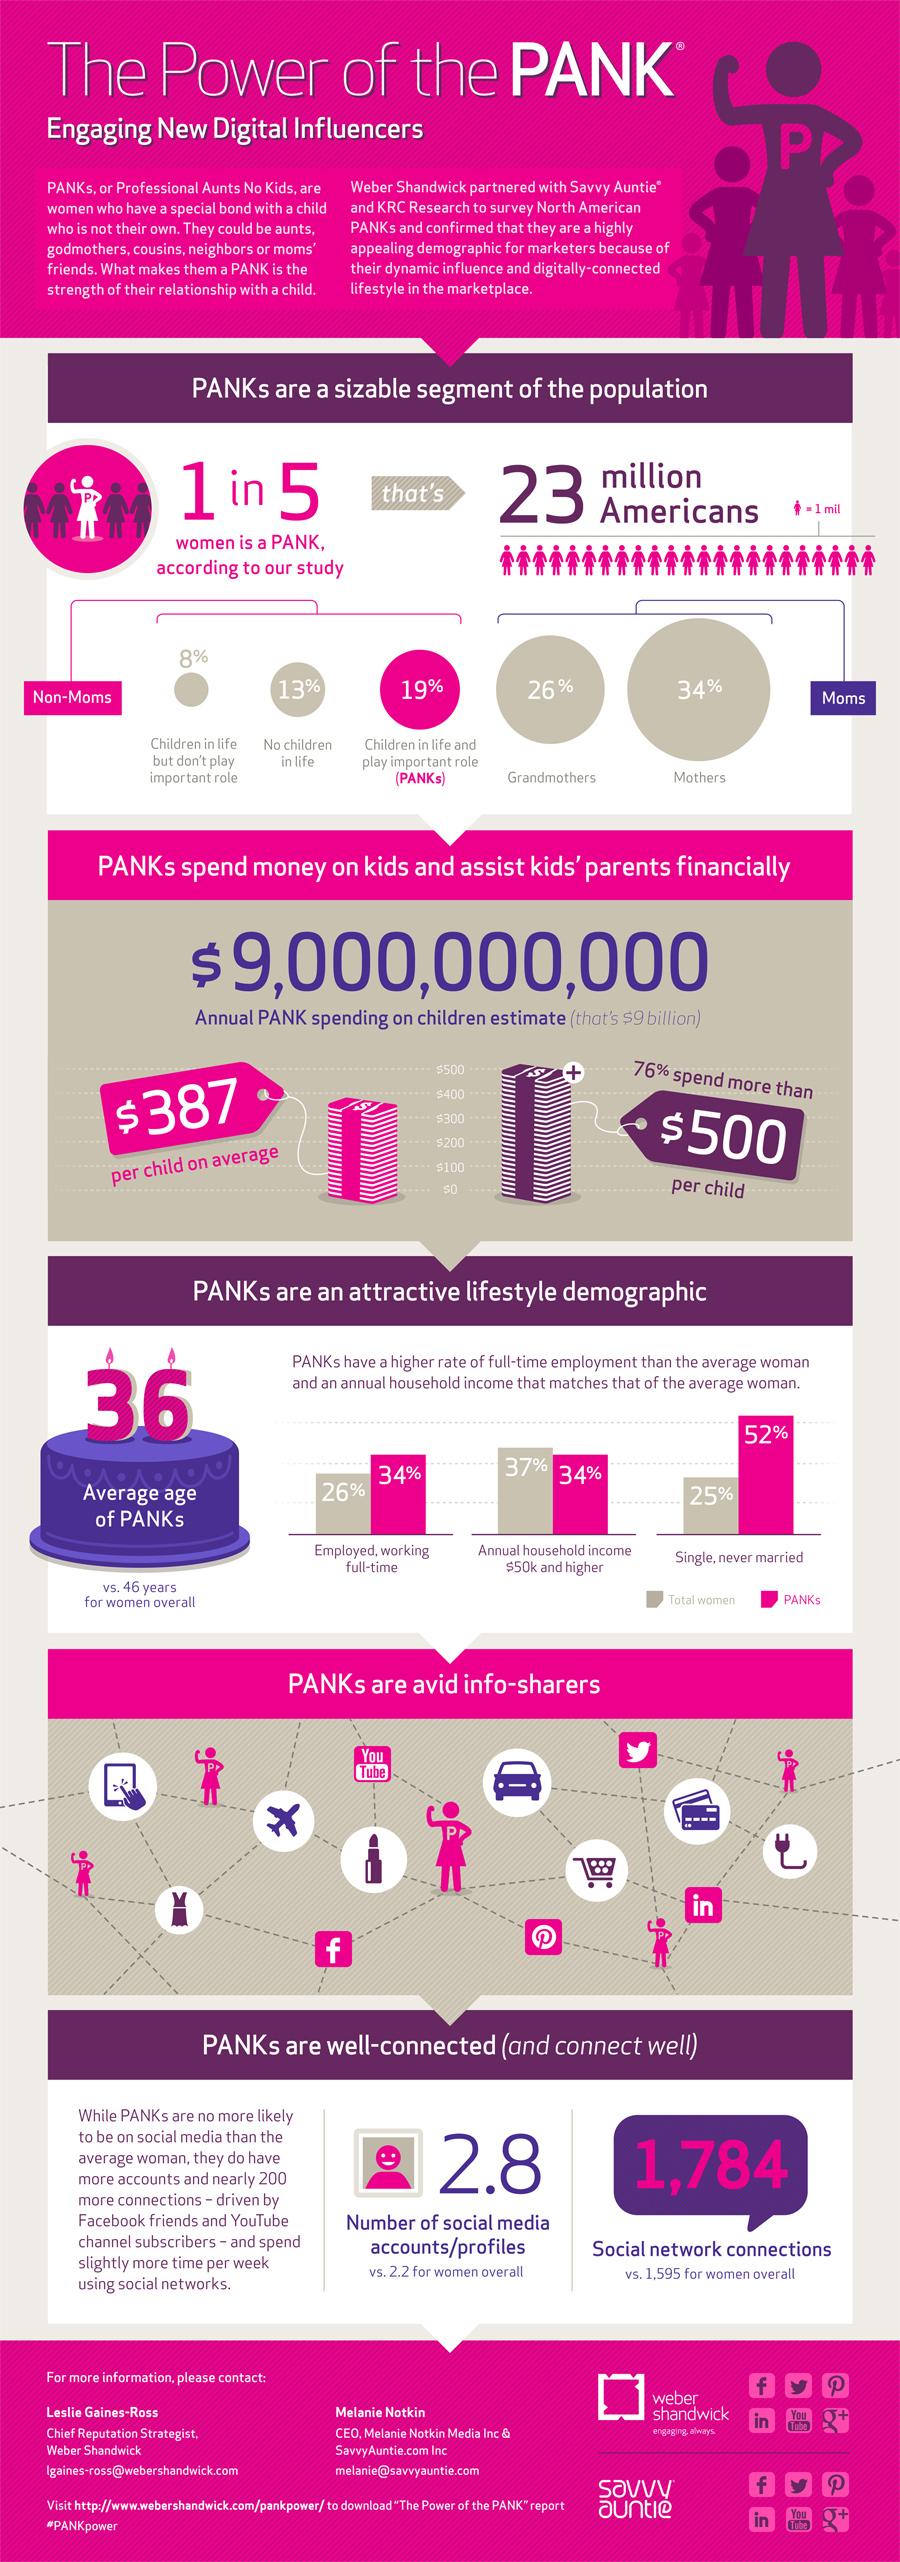 digital-women-influencers-study-the-power-of-the-pank_50b937a300d88